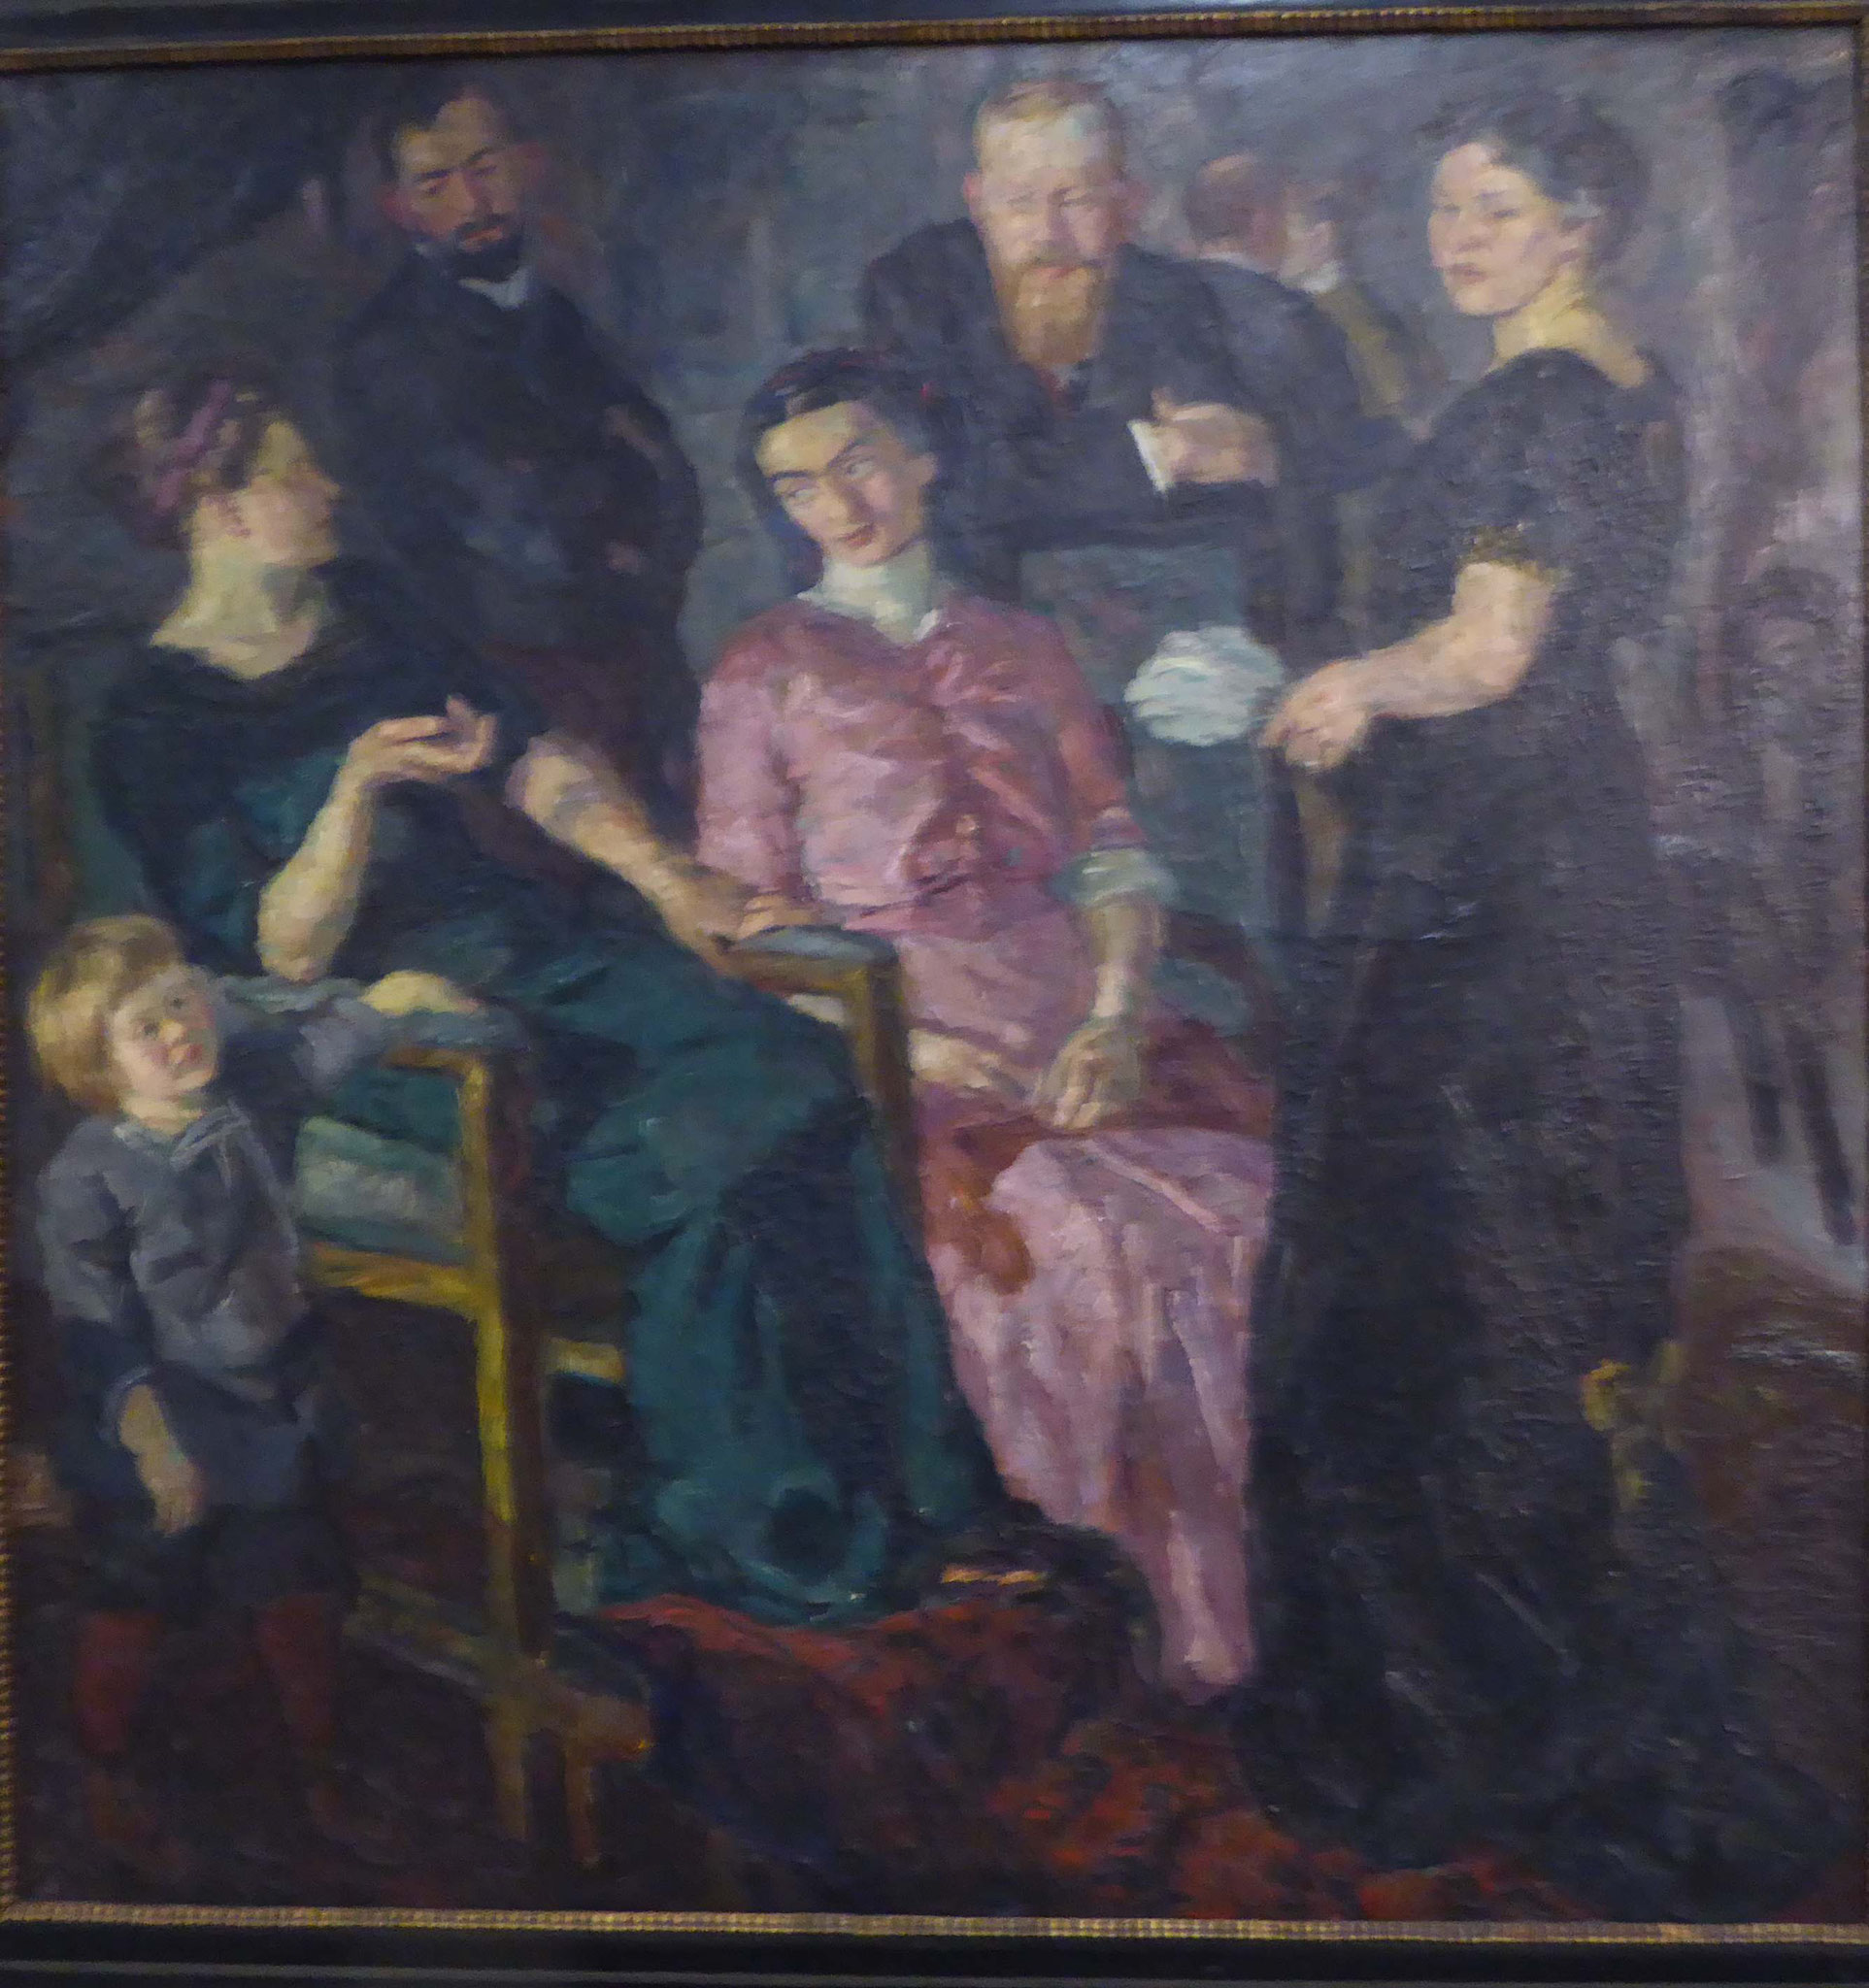 Max Beckmann, Gesellschaft II, 1911,  Museum Moritzburg, Halle